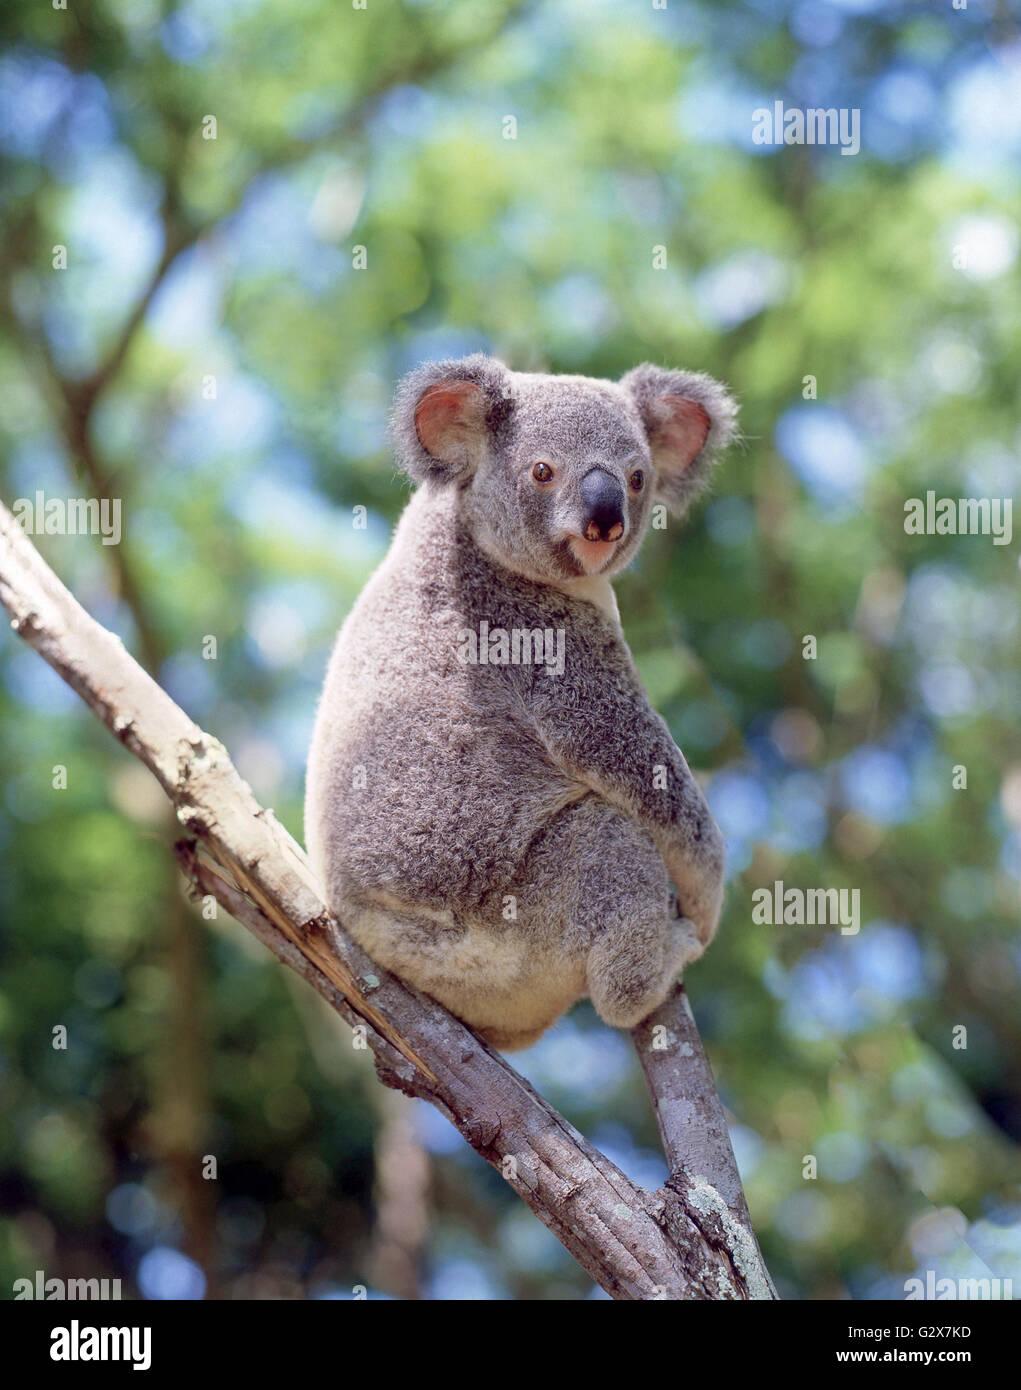 Native koala in the wild, Queensland, Australia - Stock Image